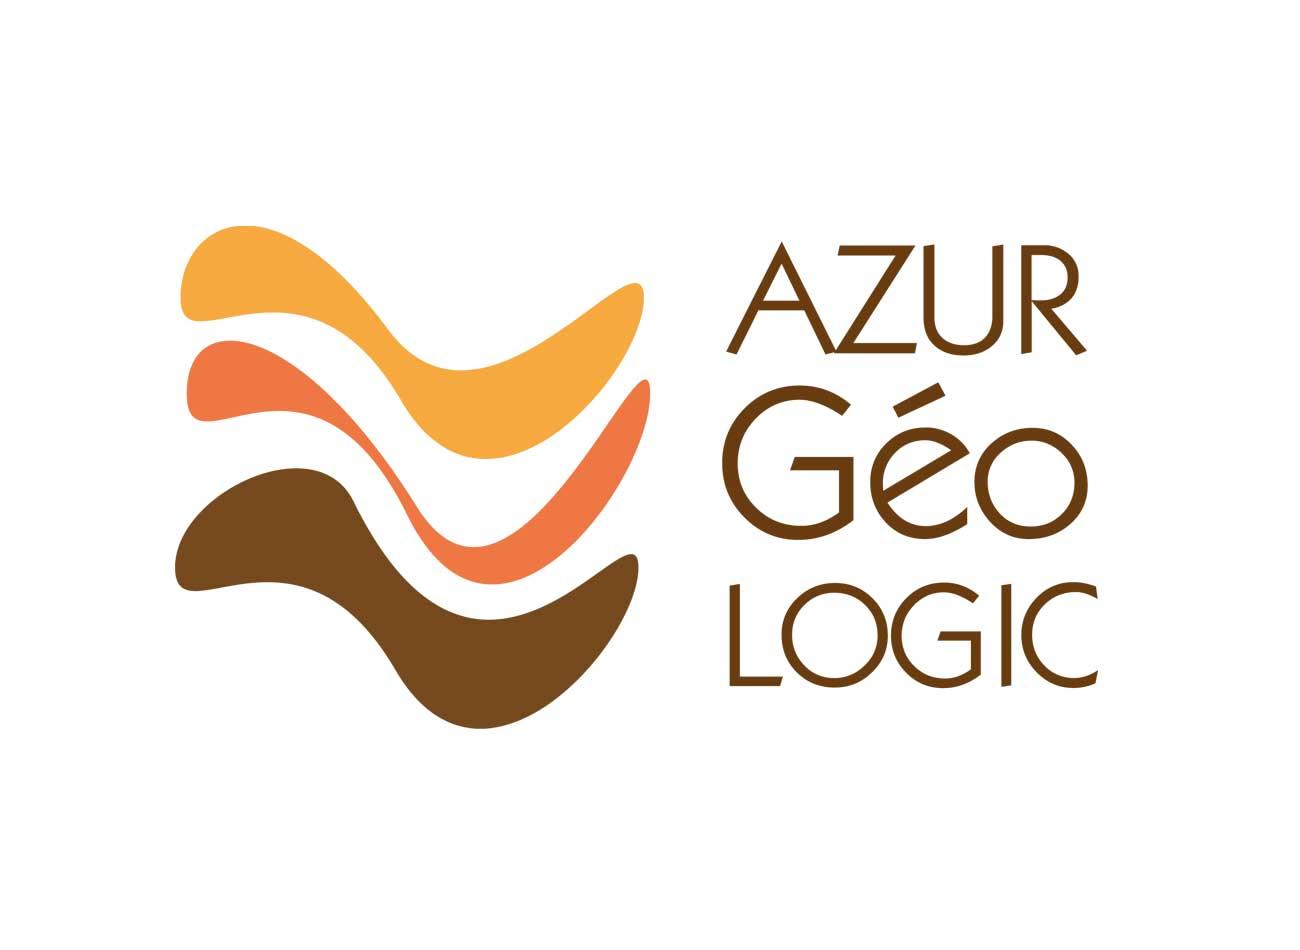 Azur Géo Logic, Vence, France